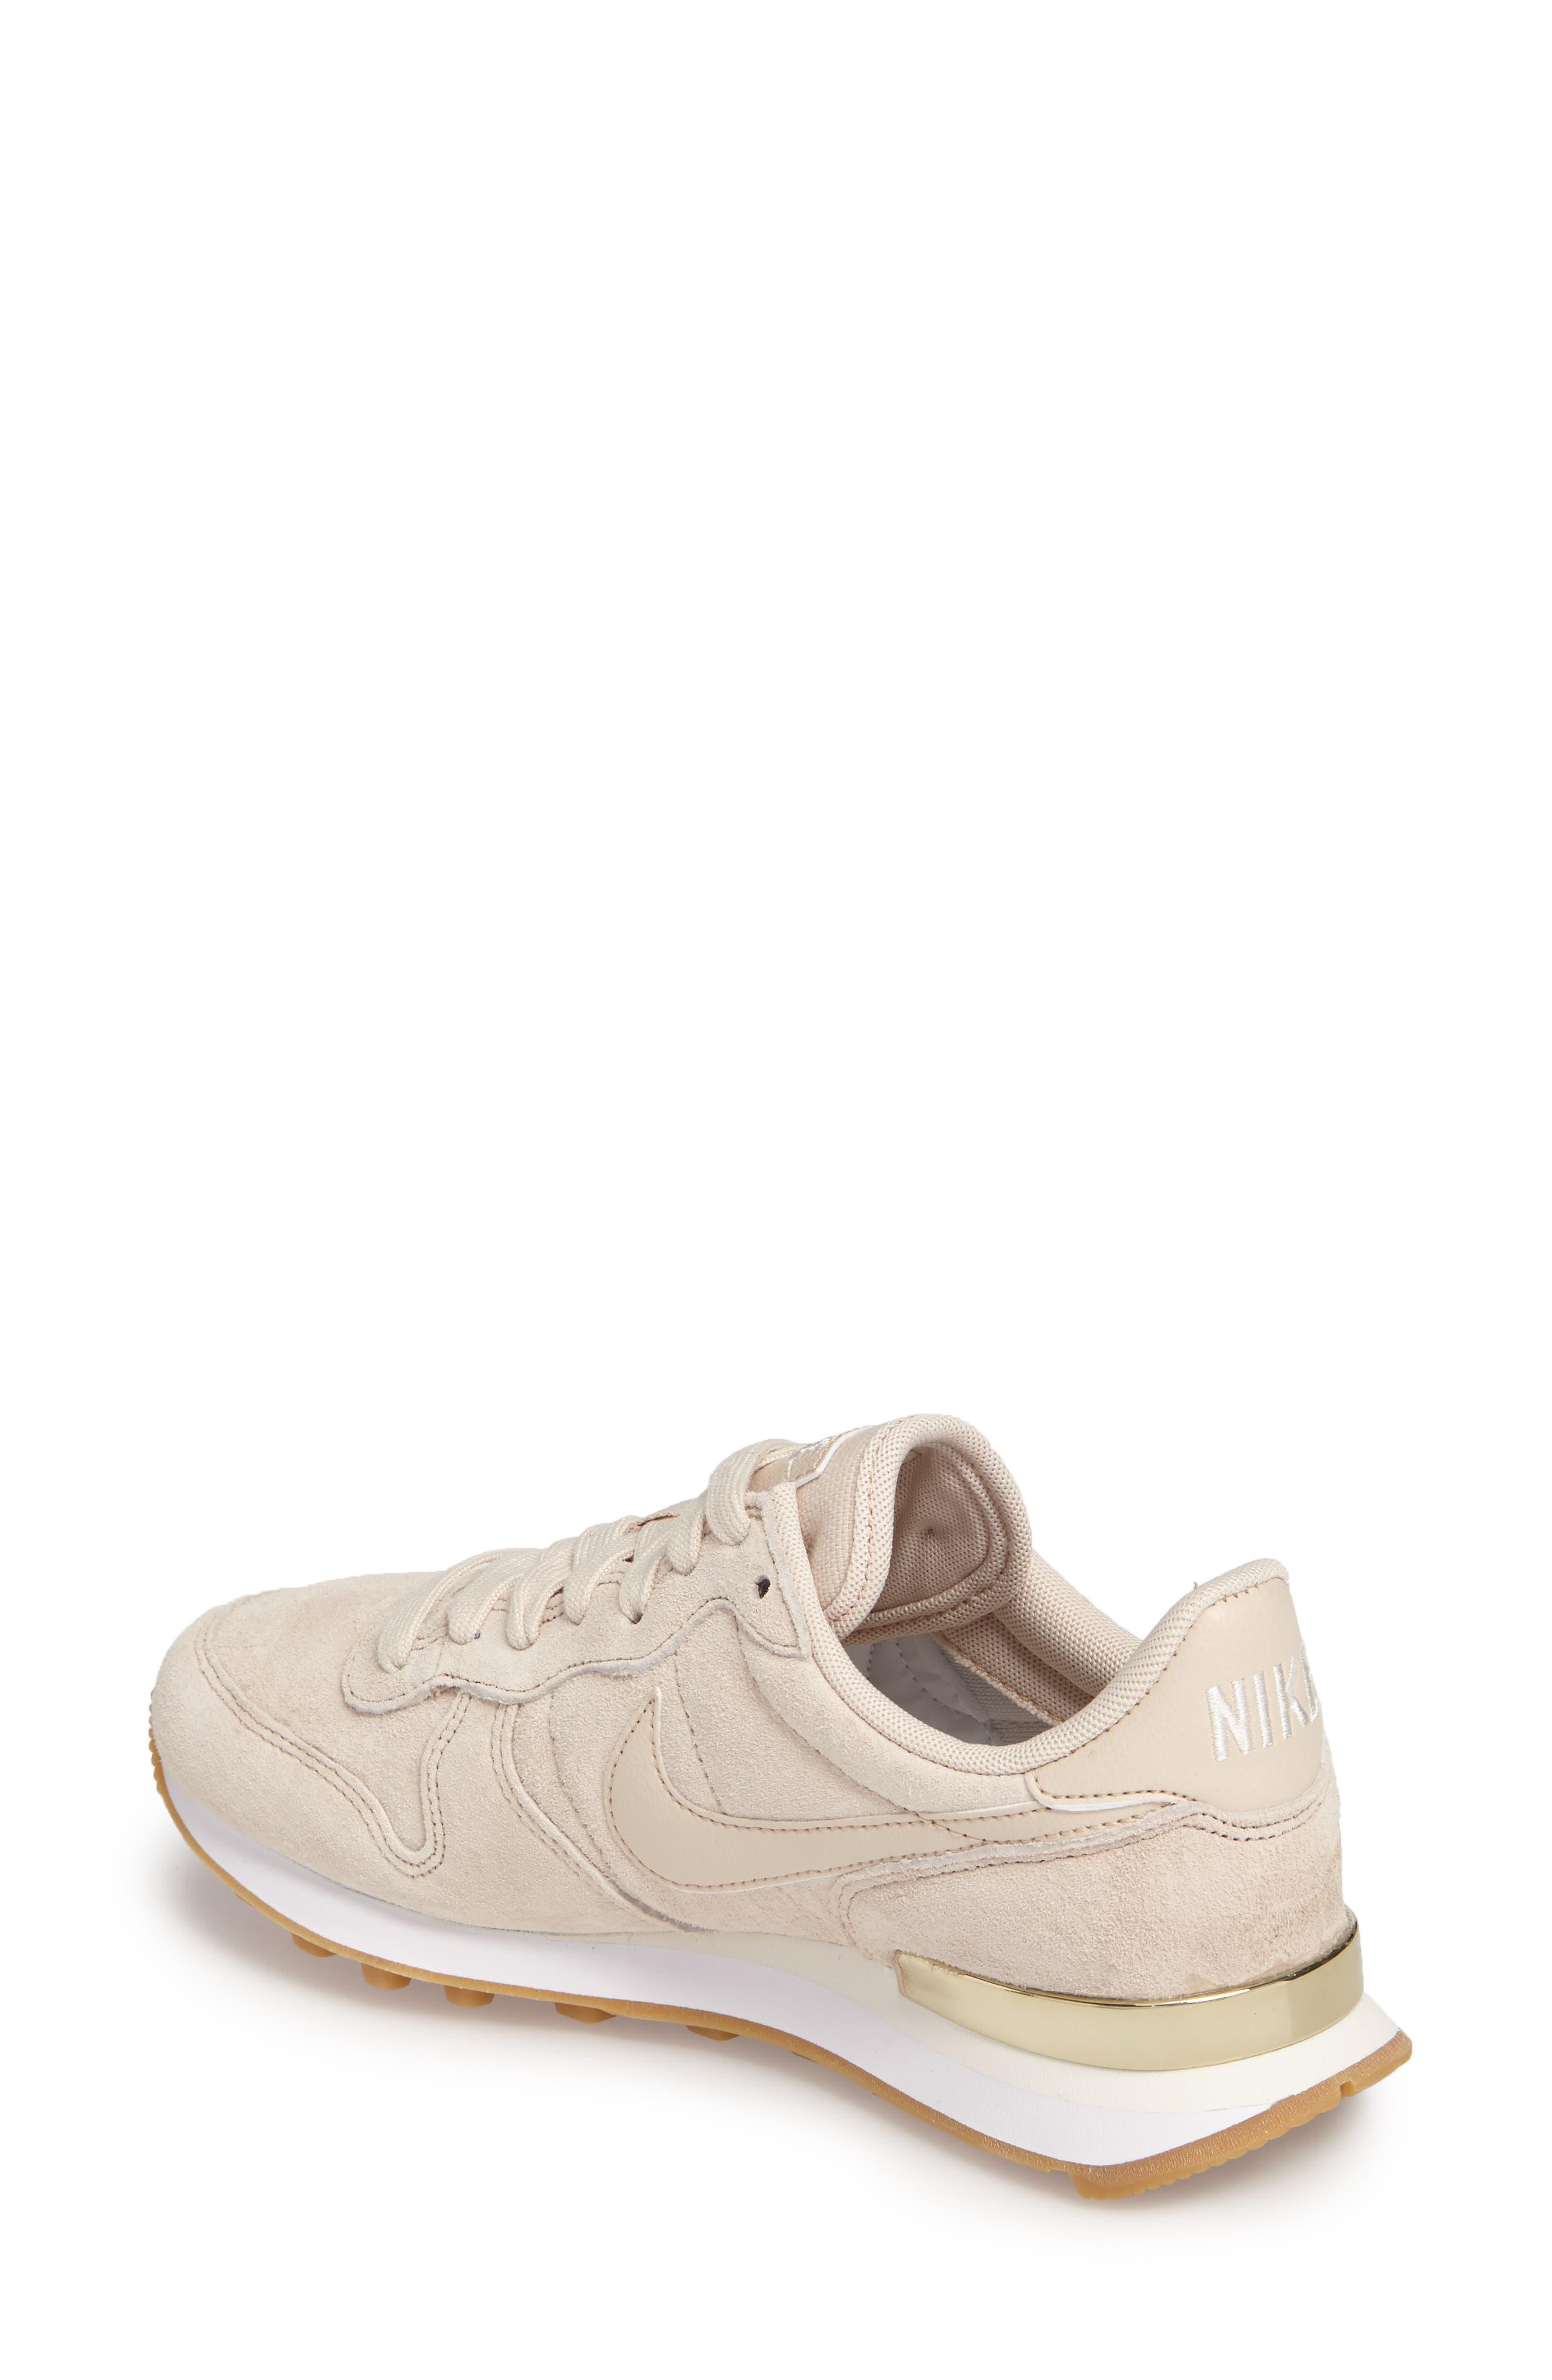 Internationalist SD Sneaker,                             Alternate thumbnail 2, color,                             250